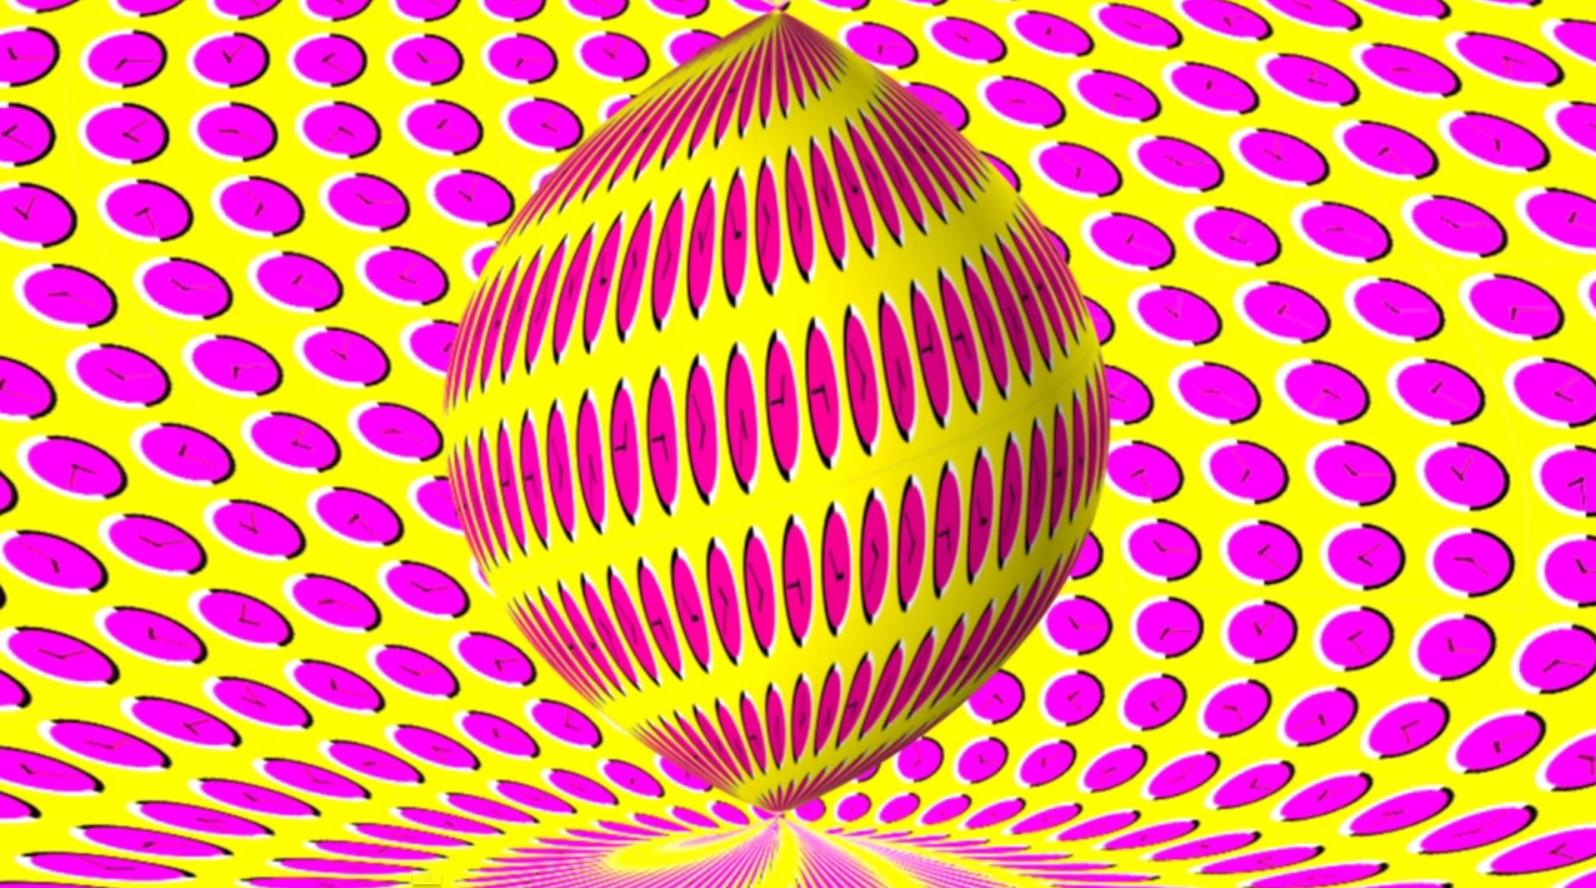 optical illusion 15 (spinning)